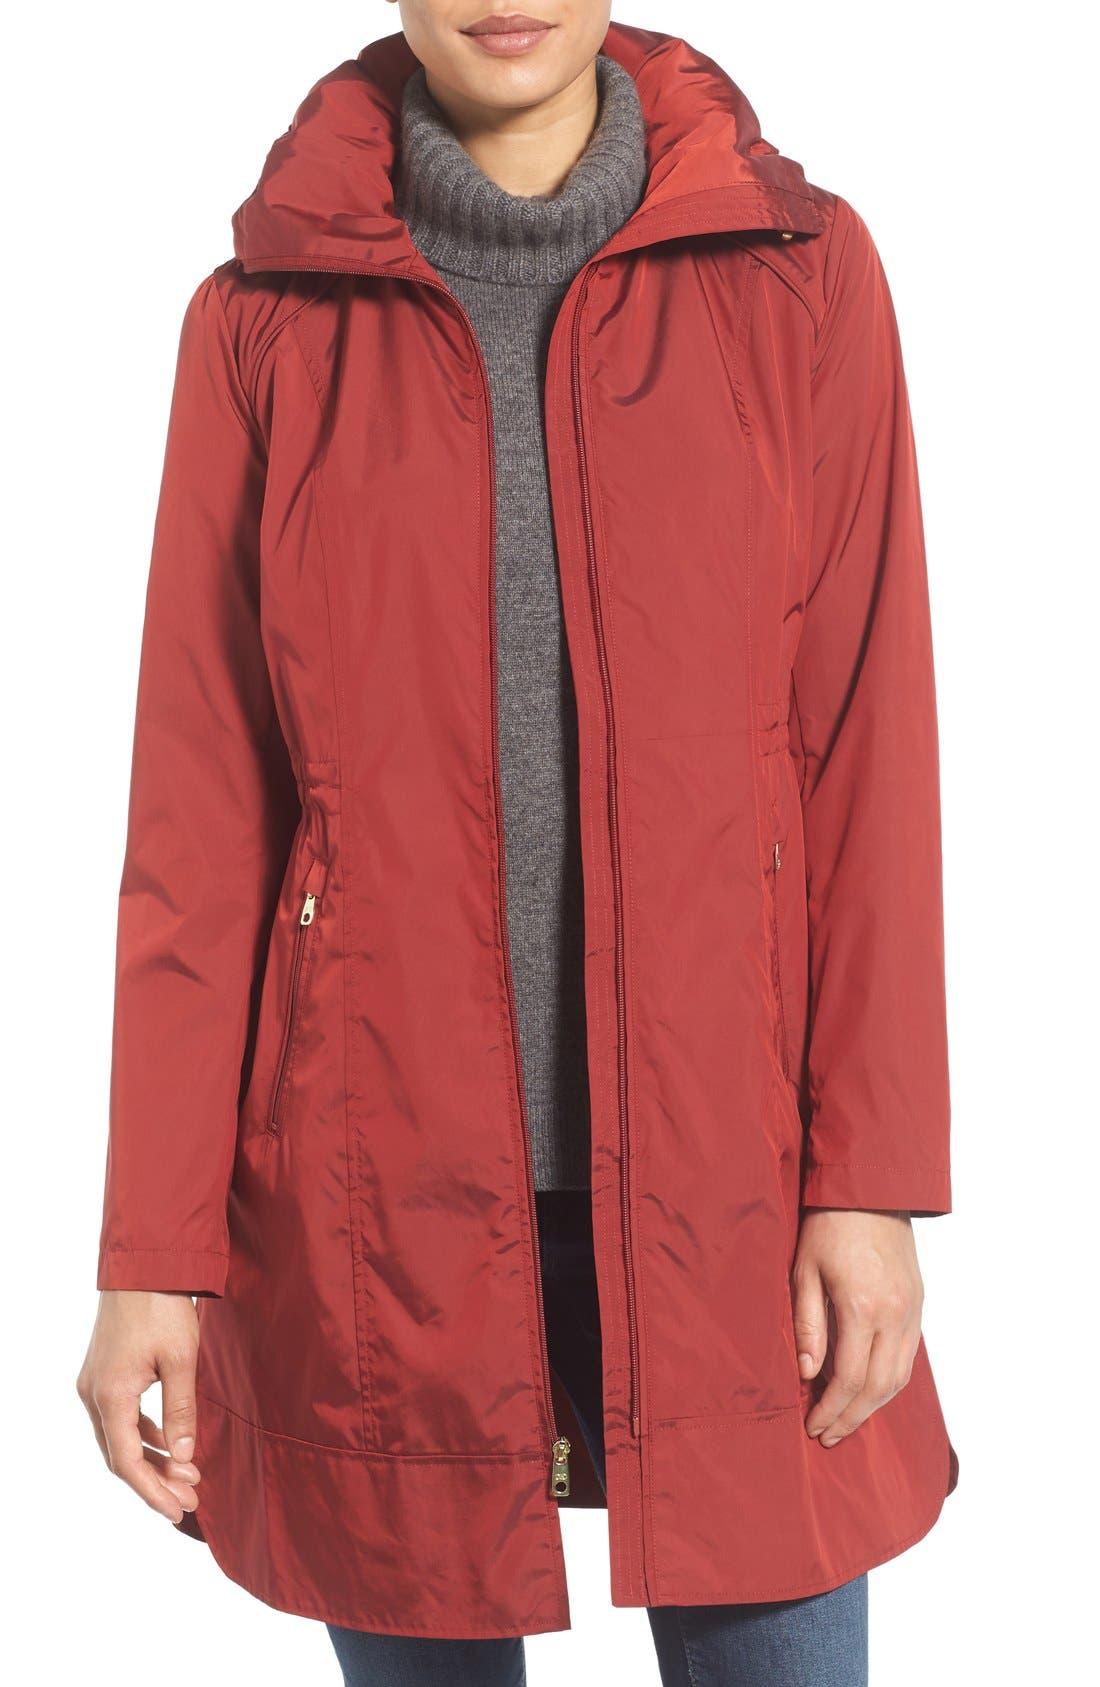 COLE HAAN SIGNATURE Packable Rain Jacket